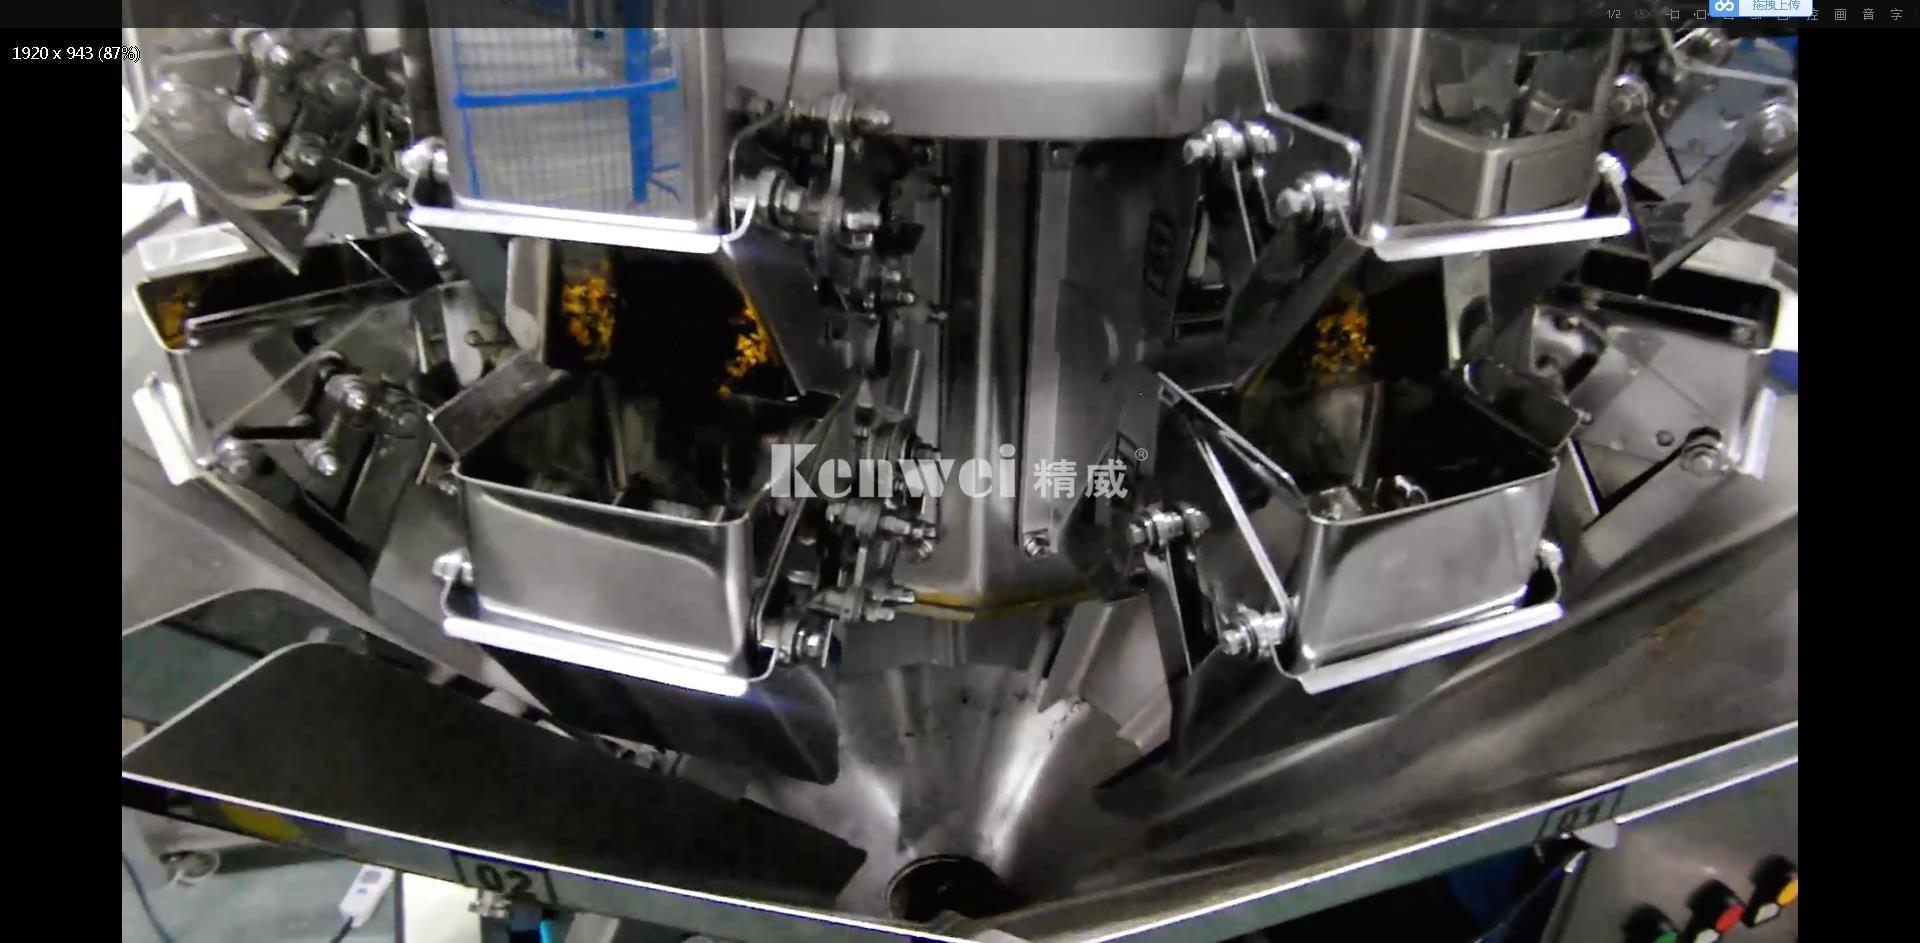 Kenwei-Mini Combined Weighing And Packaging Machine - Dried chrysanthemum